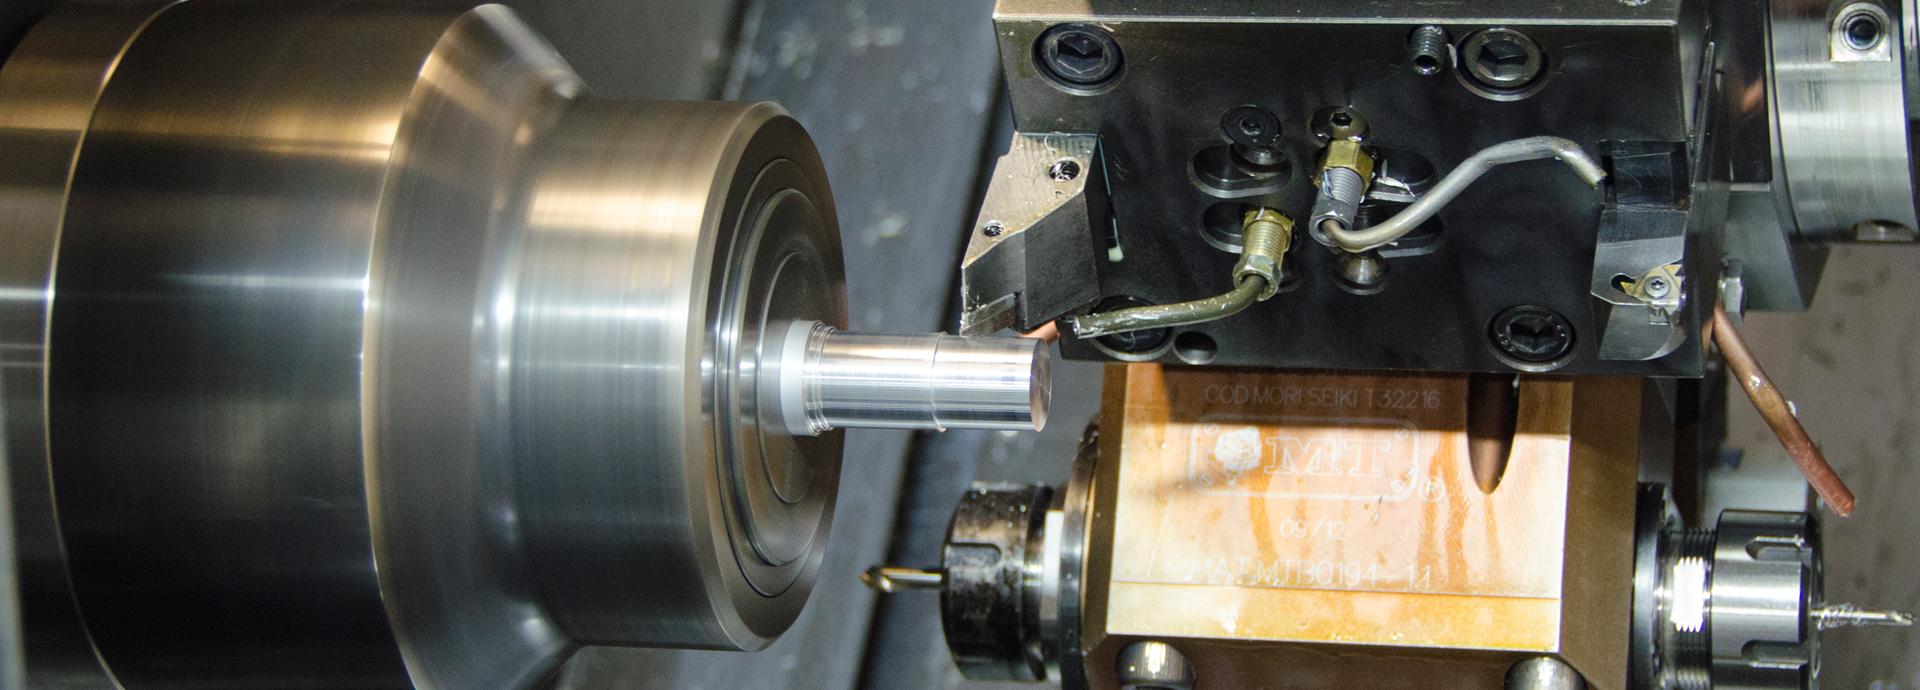 CNC lathe   Horschel Brothers Precision - Springville, NY